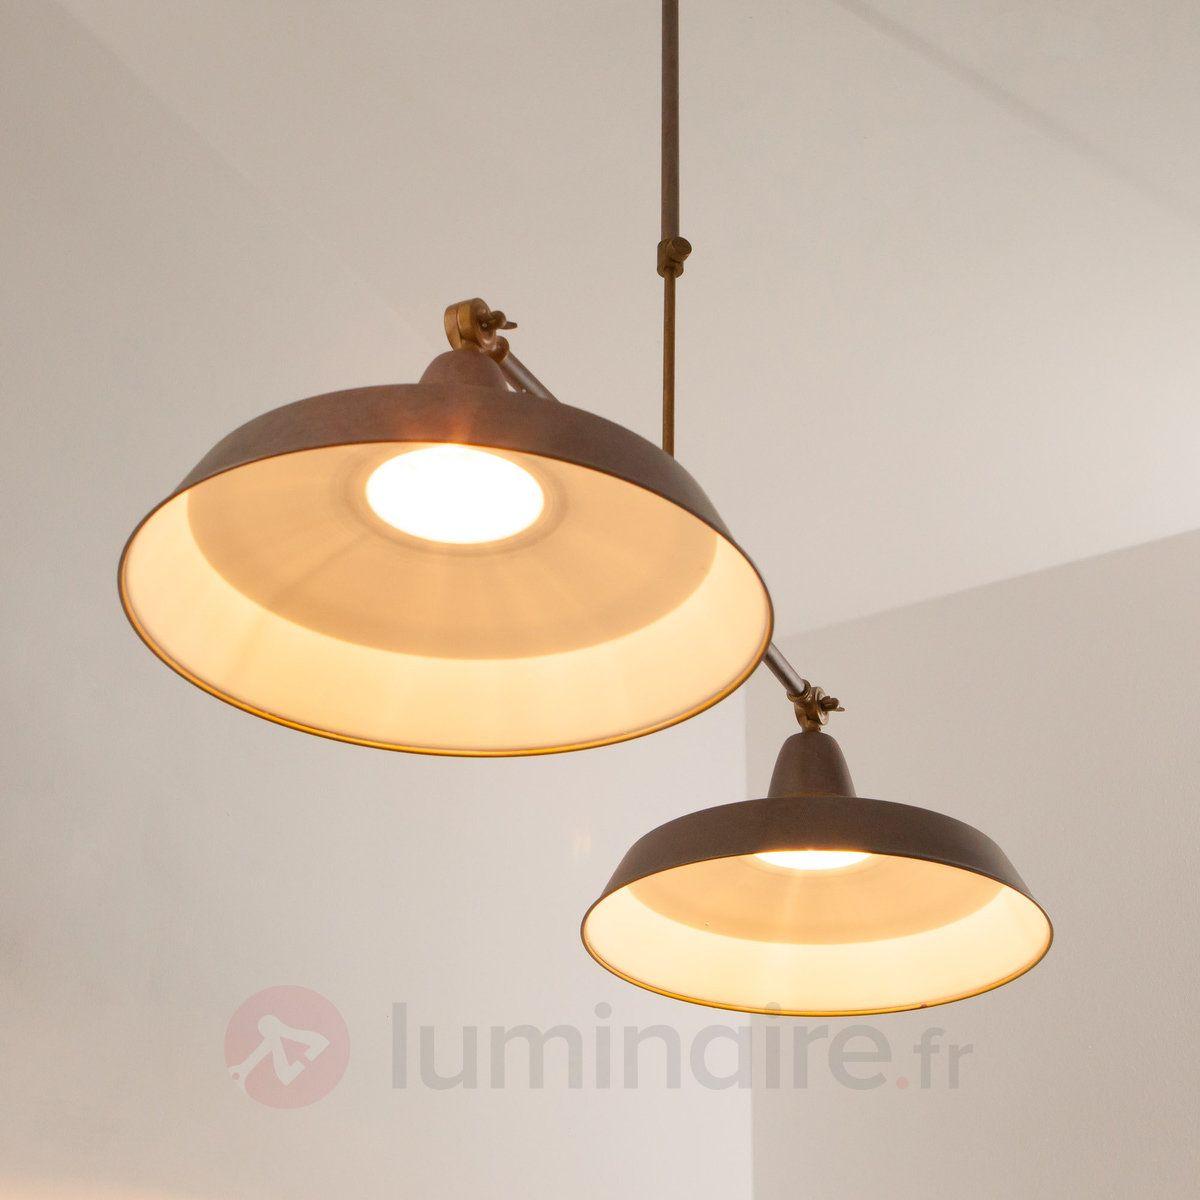 Luminaire 2 lampes